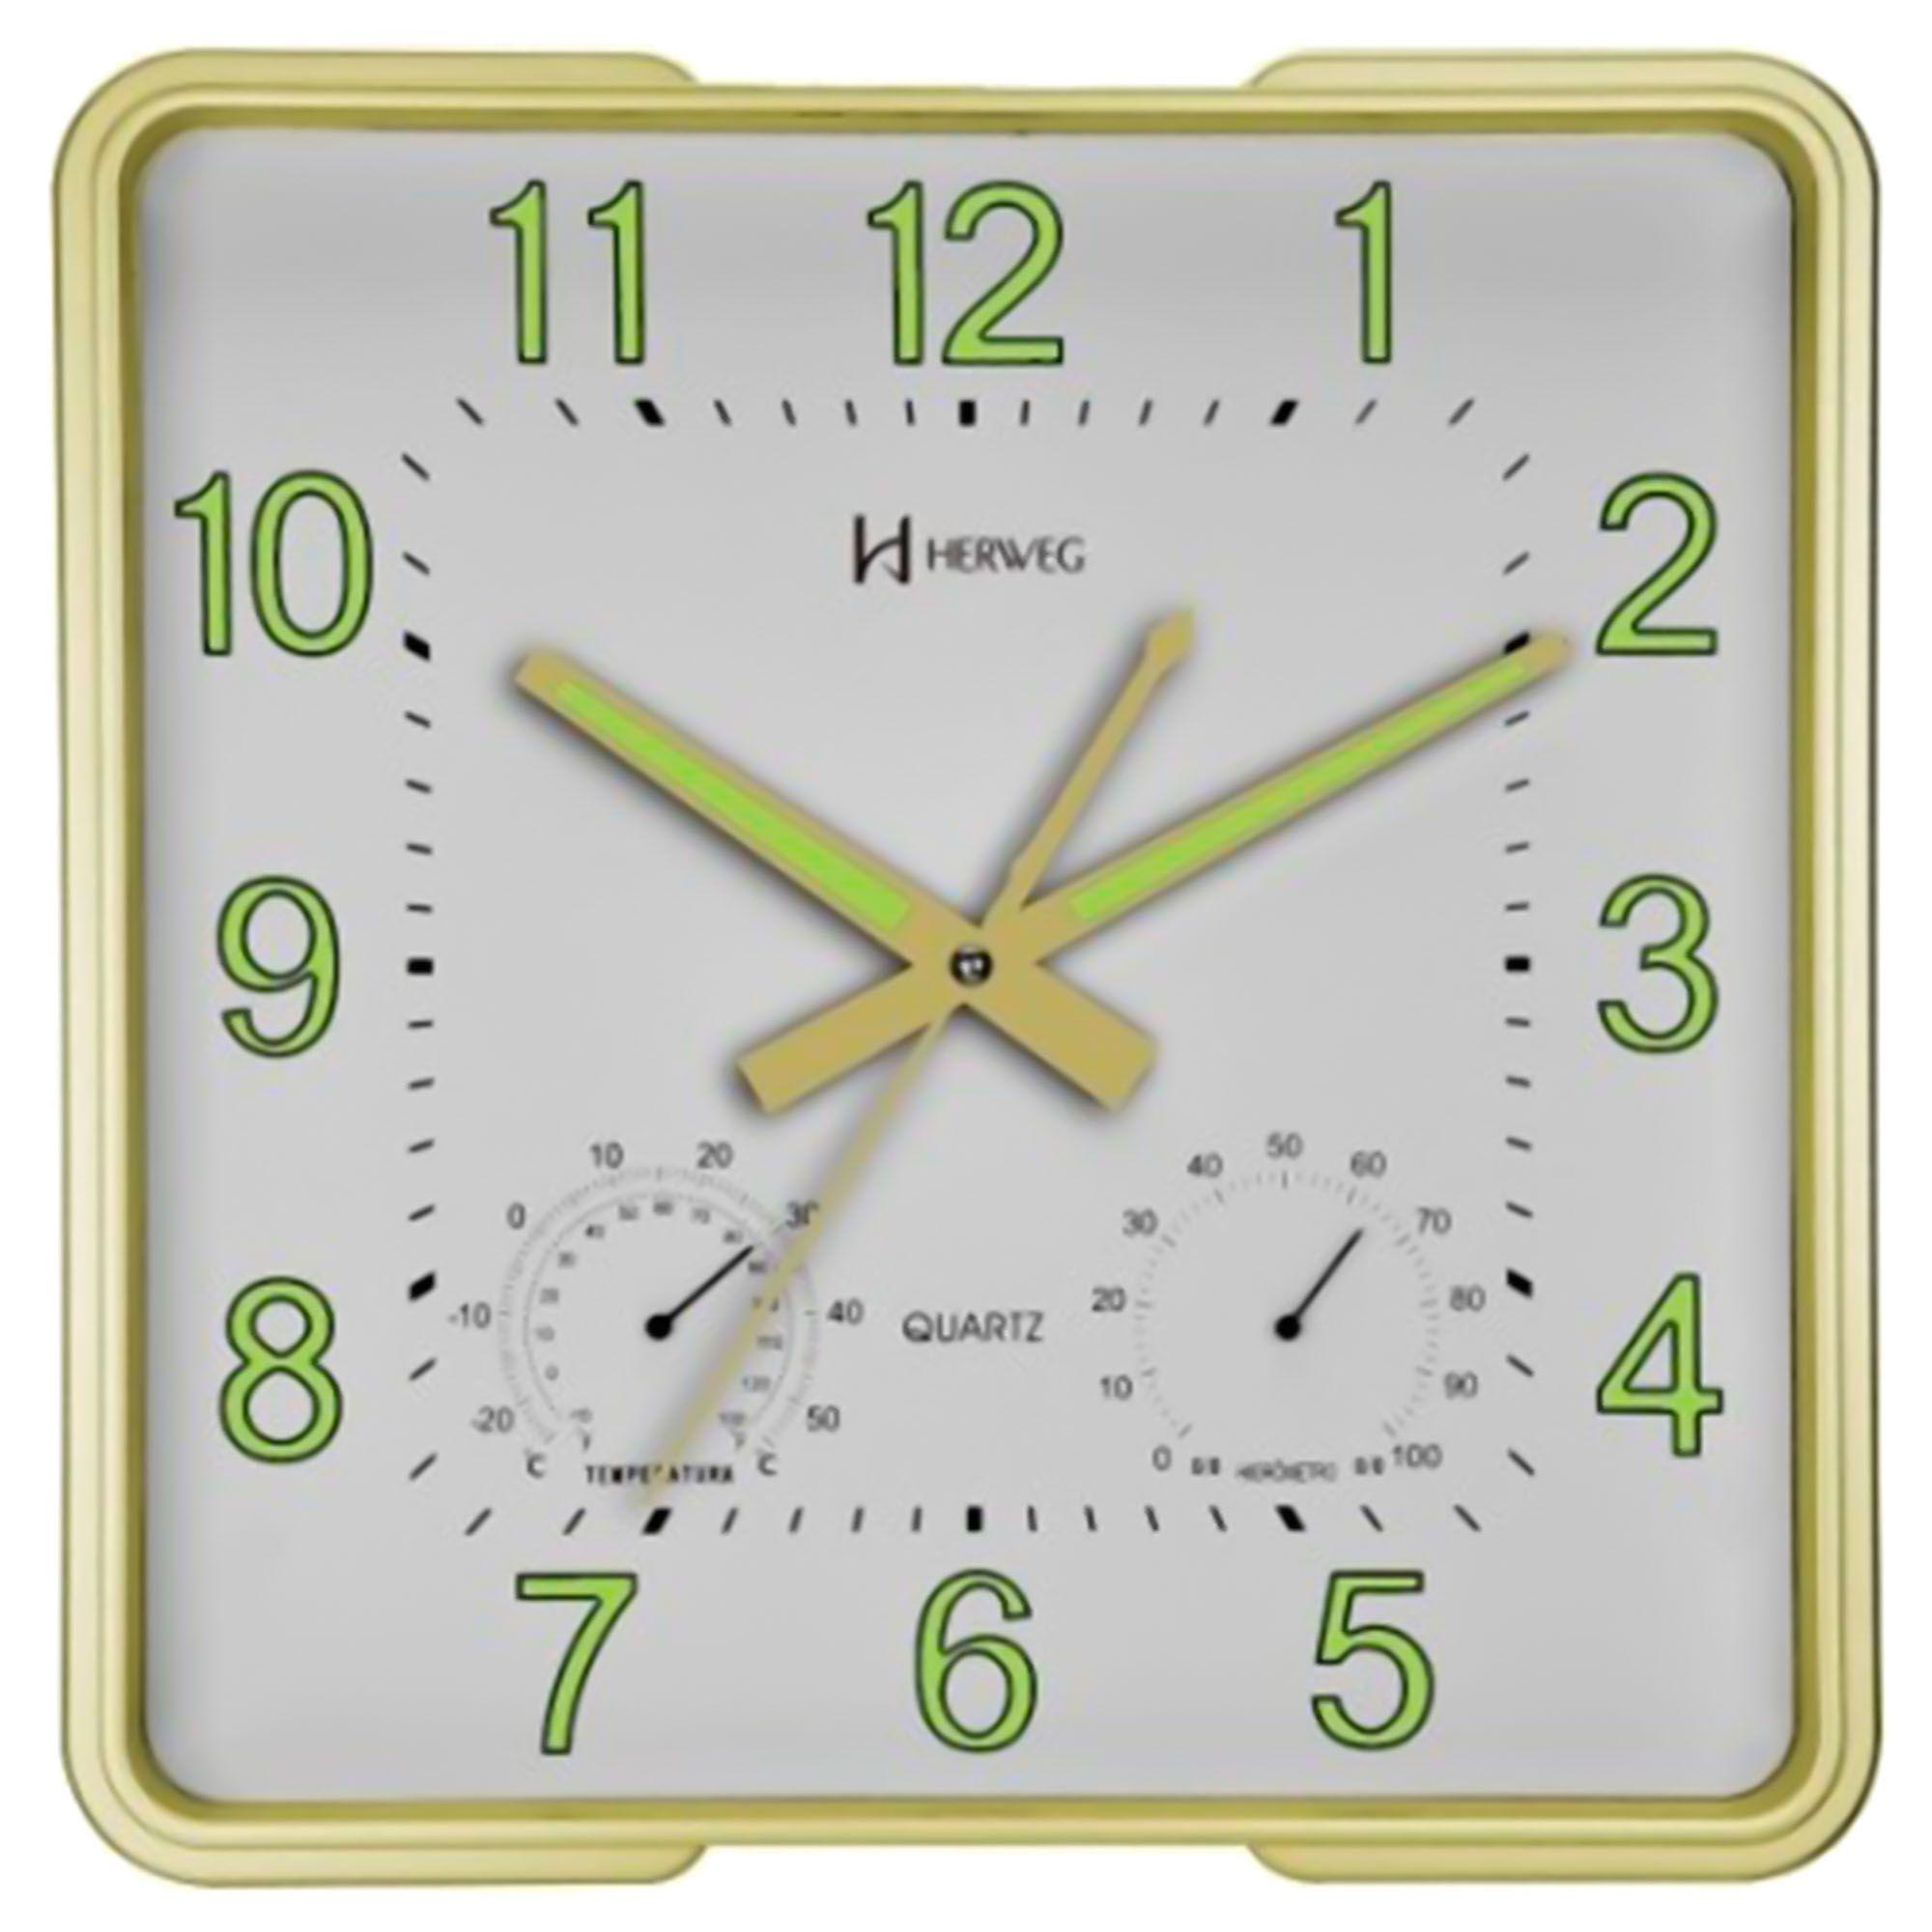 Relógio de Parede Analógico Herweg 6434 029 Dourado Claro